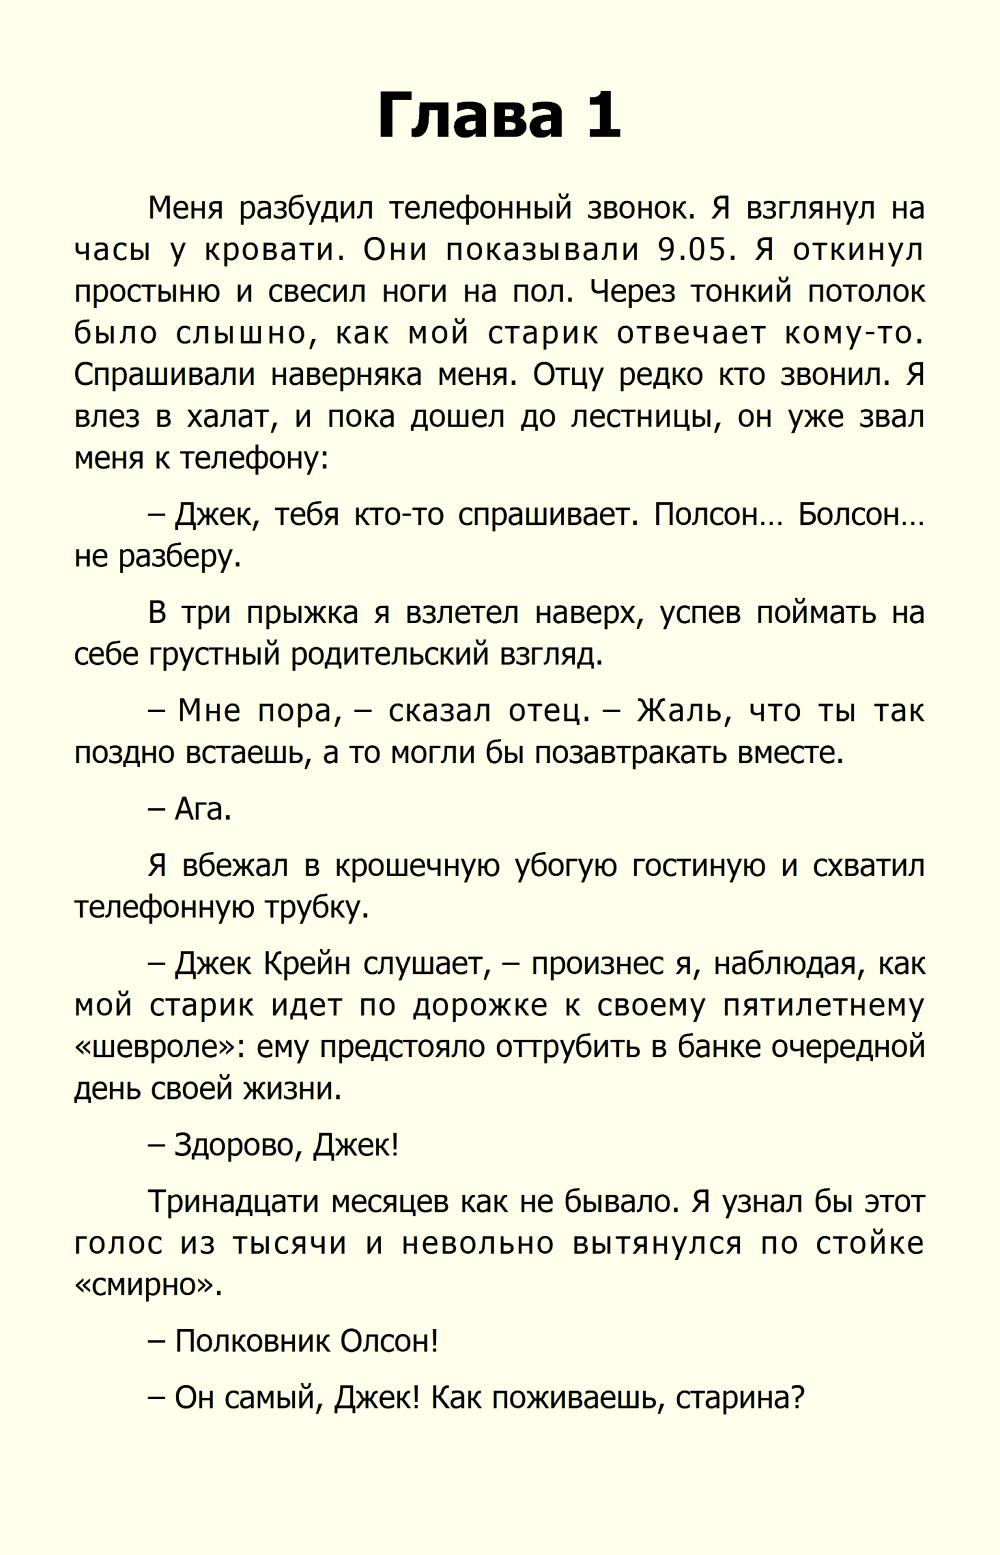 http://i6.imageban.ru/out/2013/11/28/0595b77affe9a498c0b63c4dc71c90b4.jpg